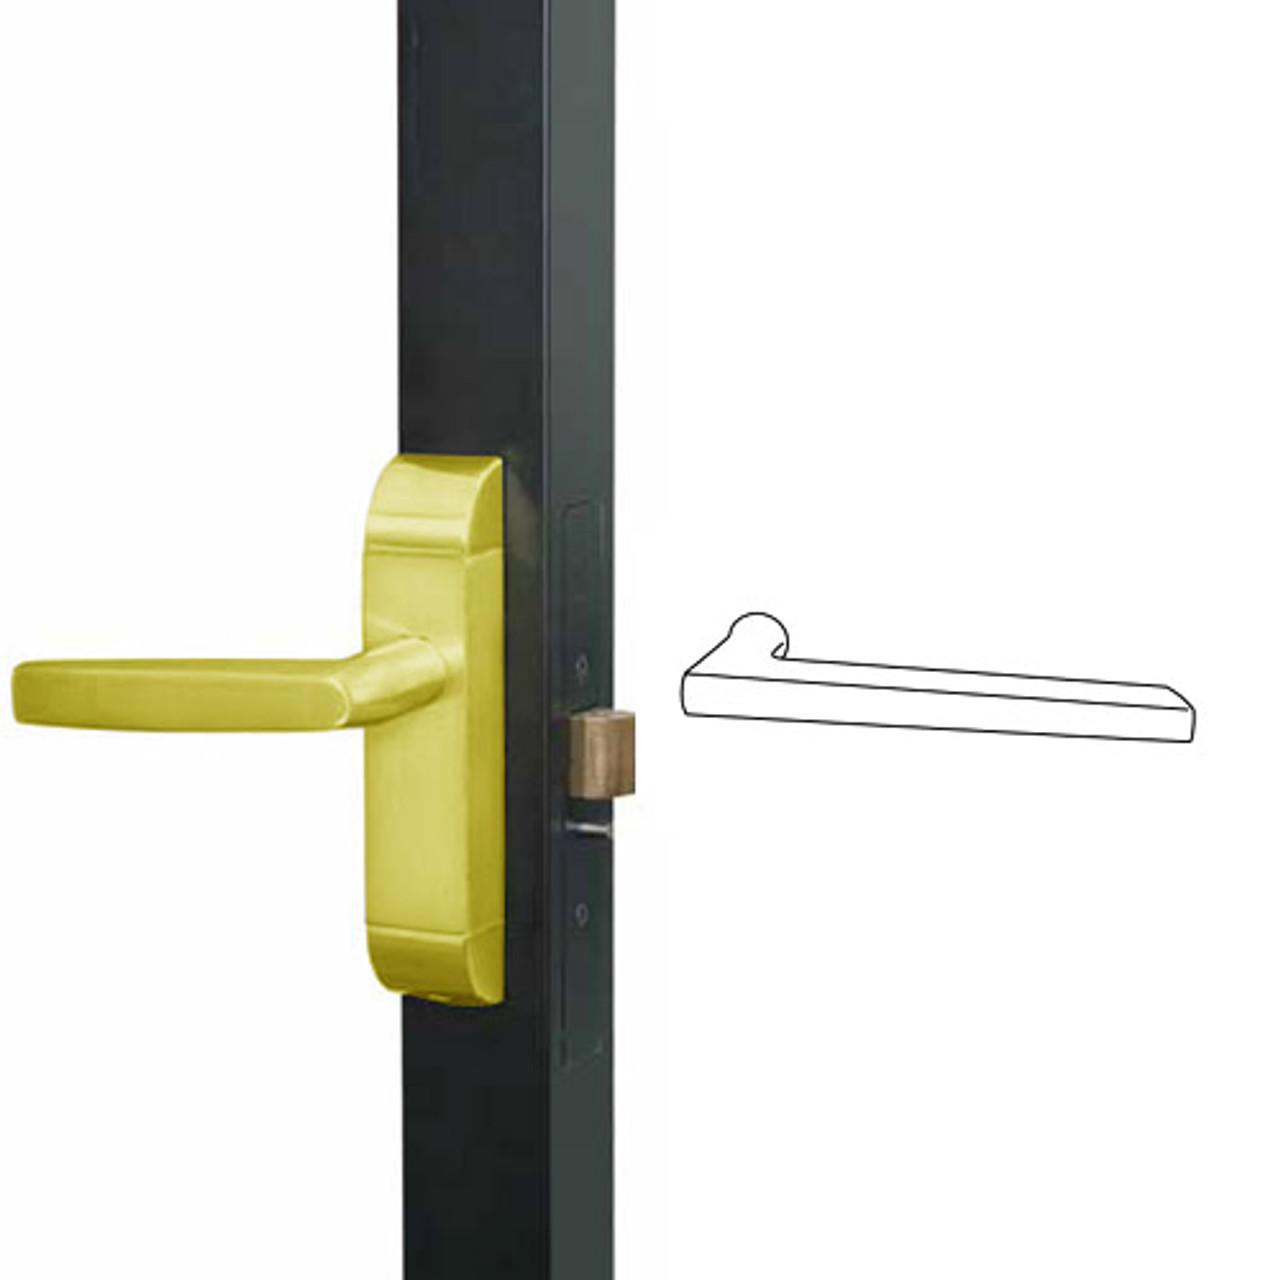 4600M-MD-612-US3 Adams Rite MD Designer Deadlatch handle in Bright Brass Finish